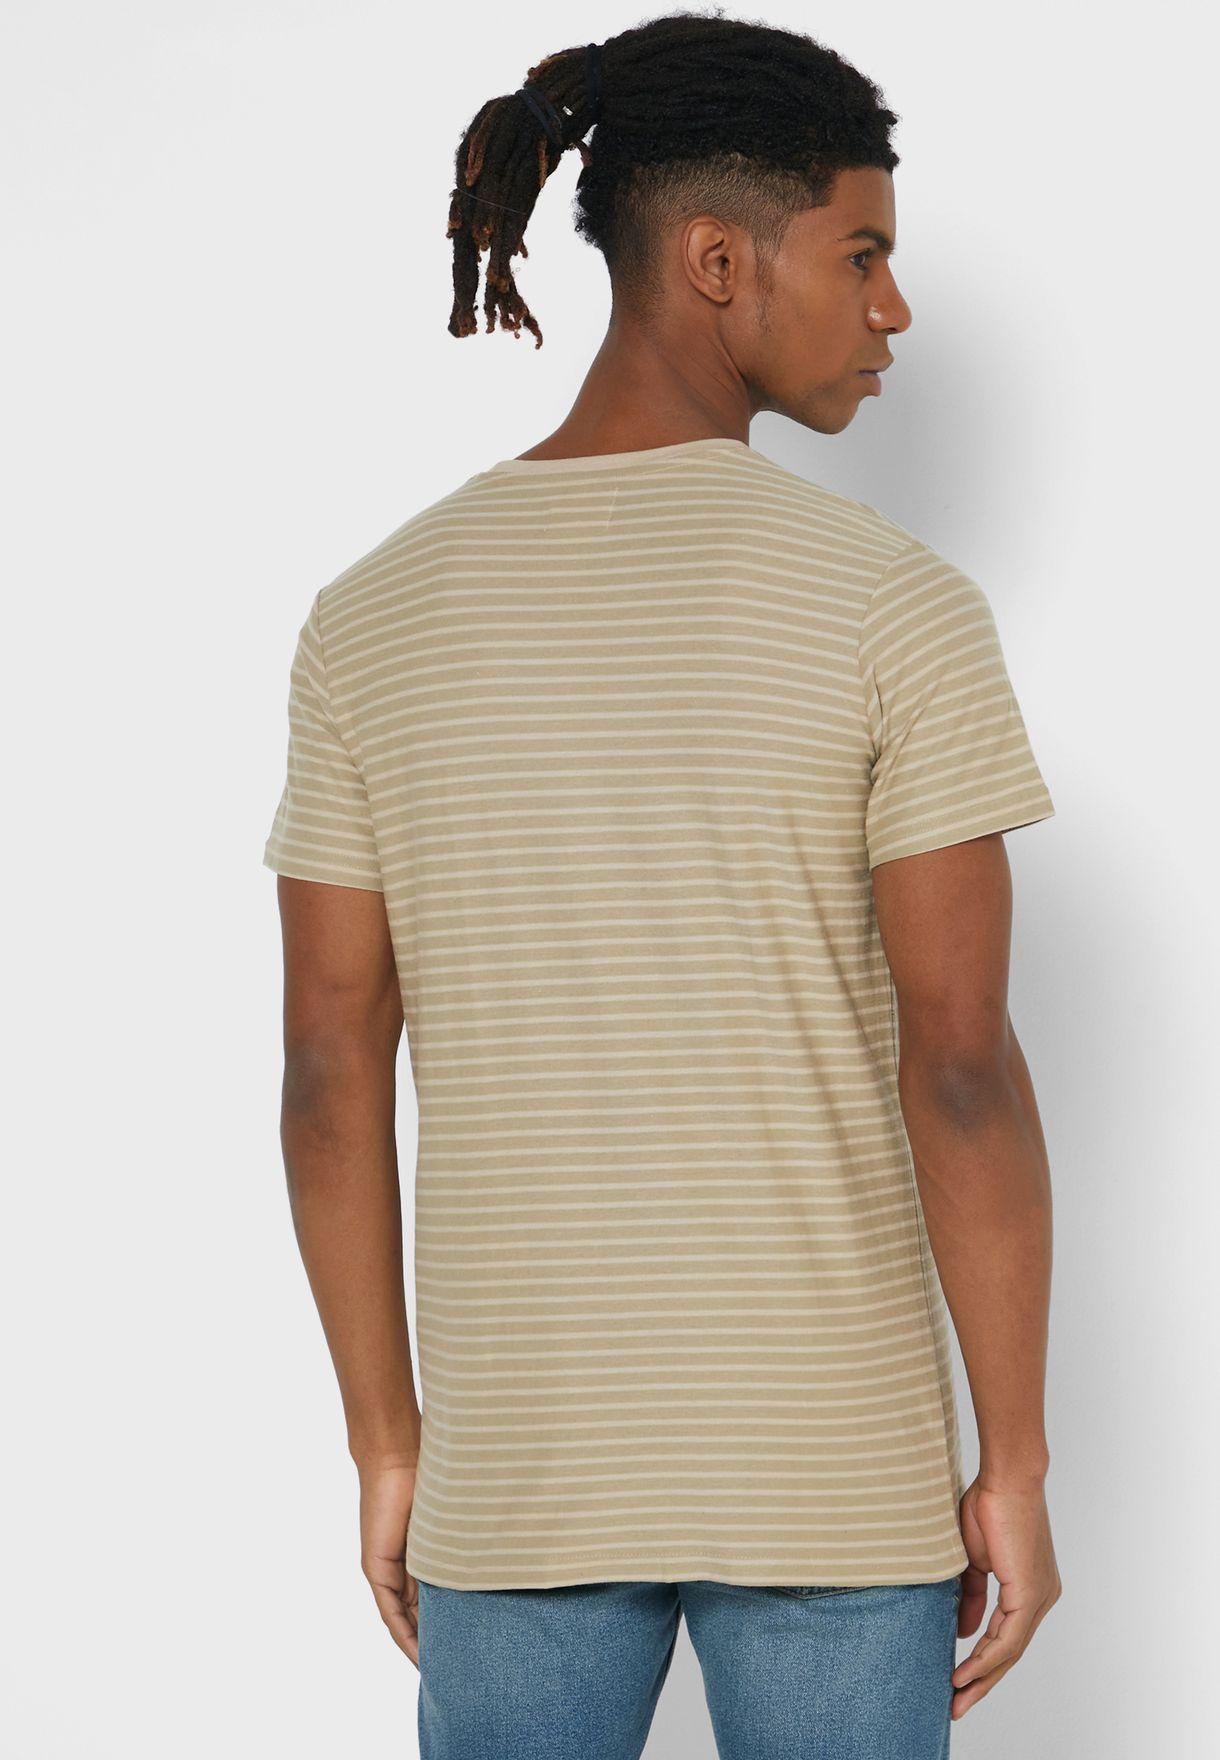 Striped Crew Neck T-Shirts